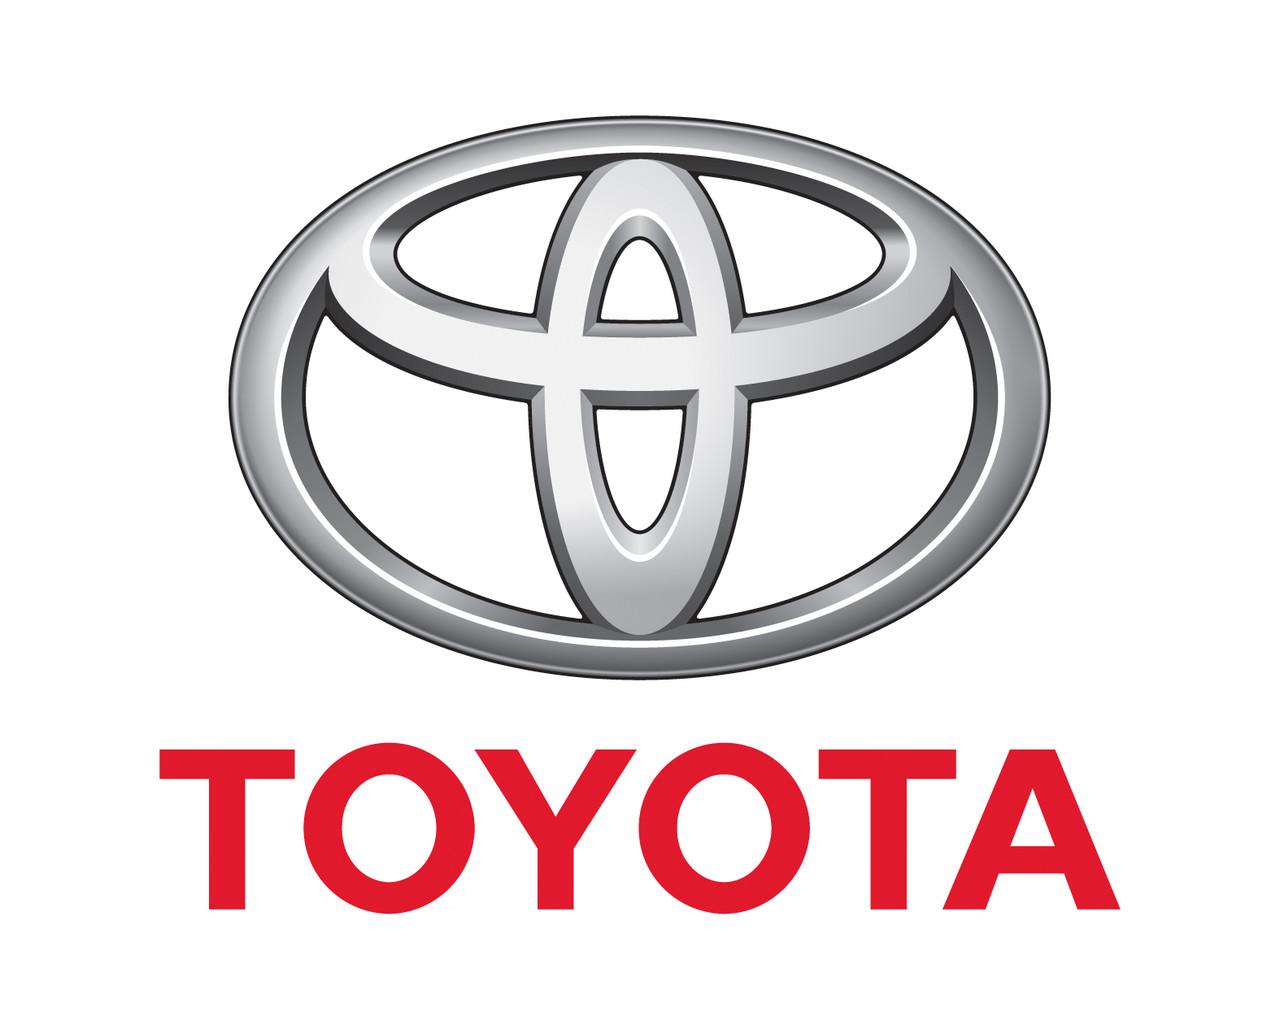 Toyota logo   Brand wallpaper Wallpaper Download 1280x1024 1280x1024